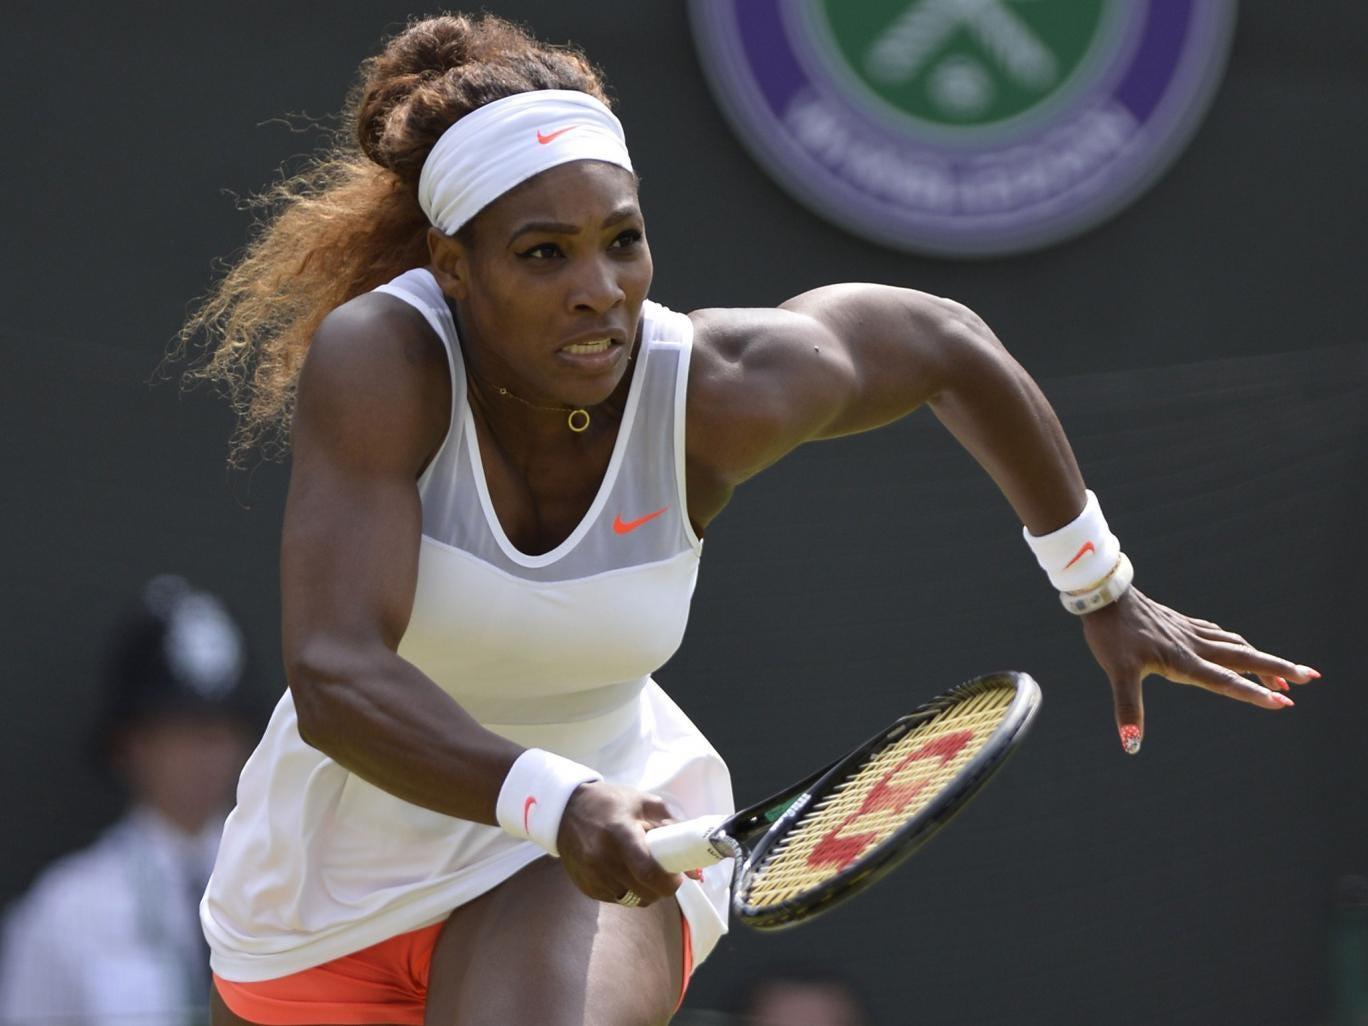 Serena Williams runs for a return against France's Caroline Garcia